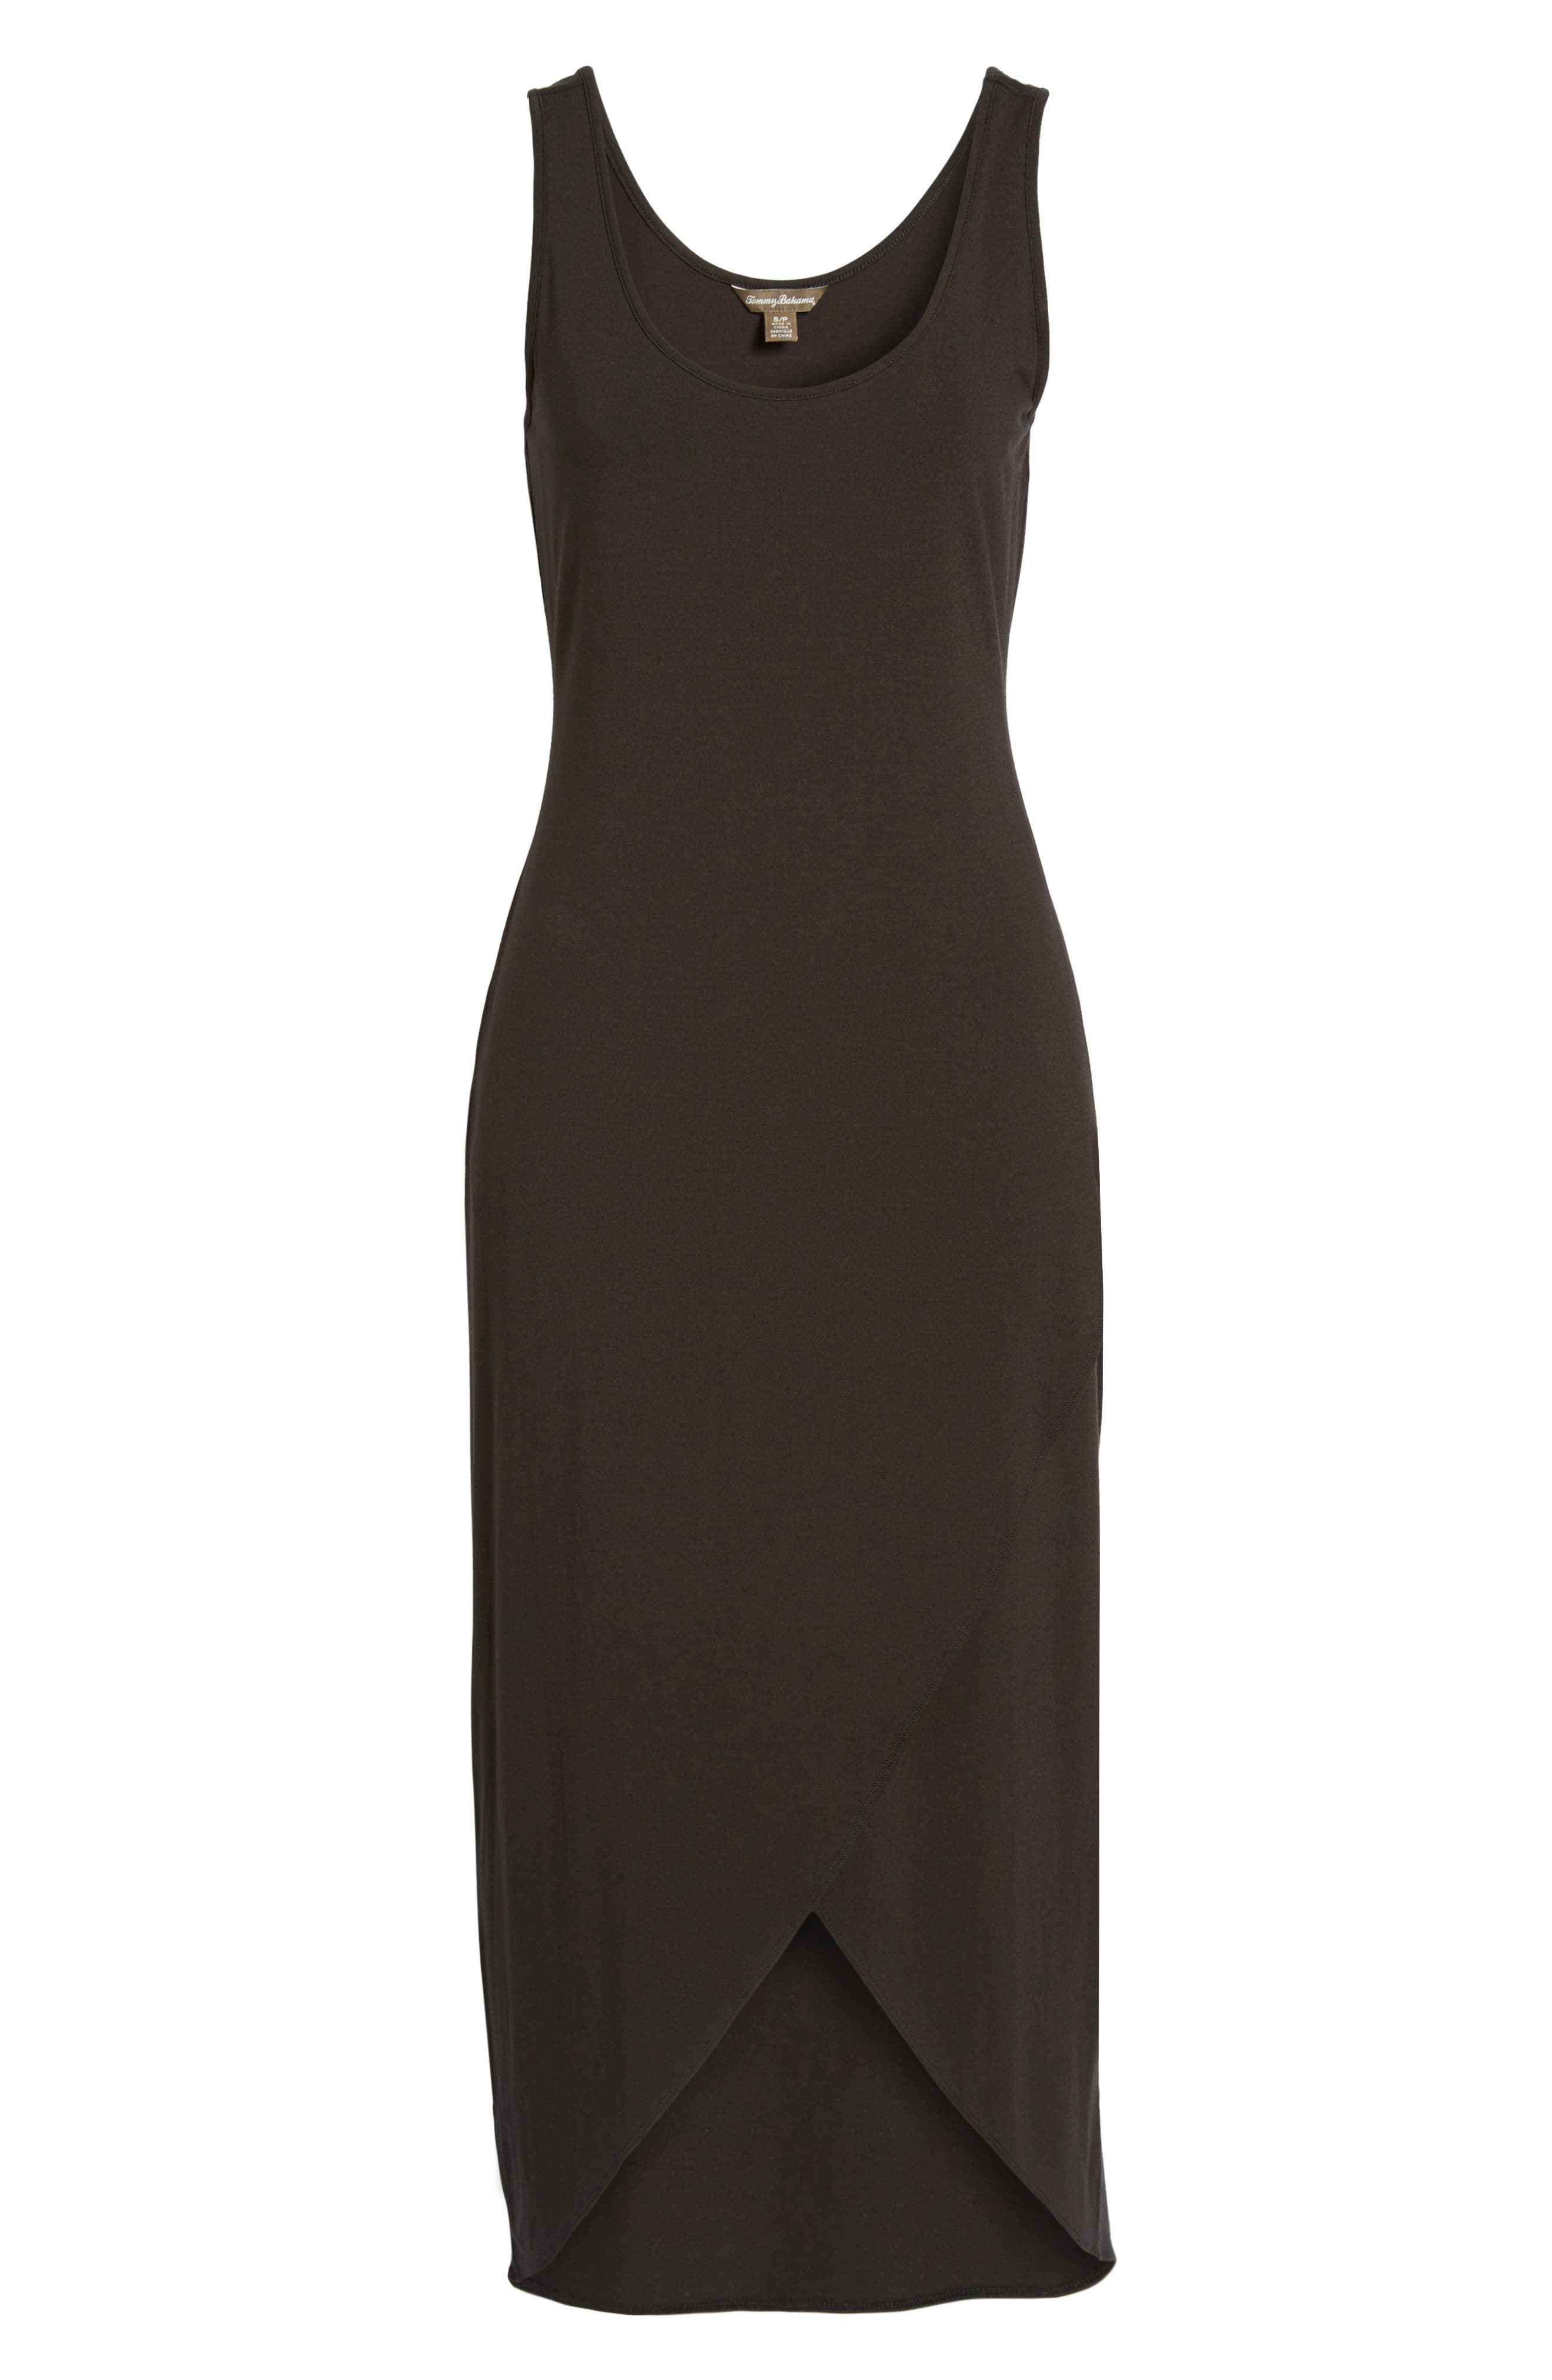 Tambour Maxi Dress,                             Main thumbnail 1, color,                             Black